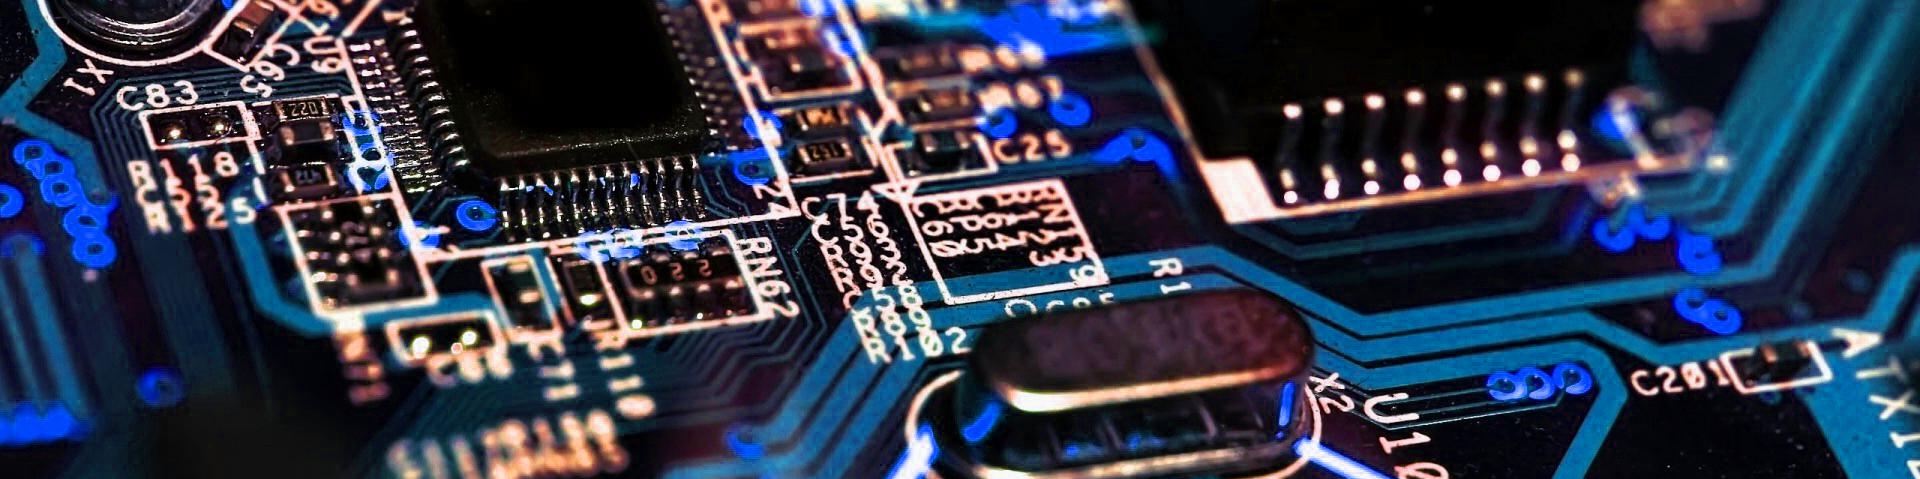 hardwarebanner